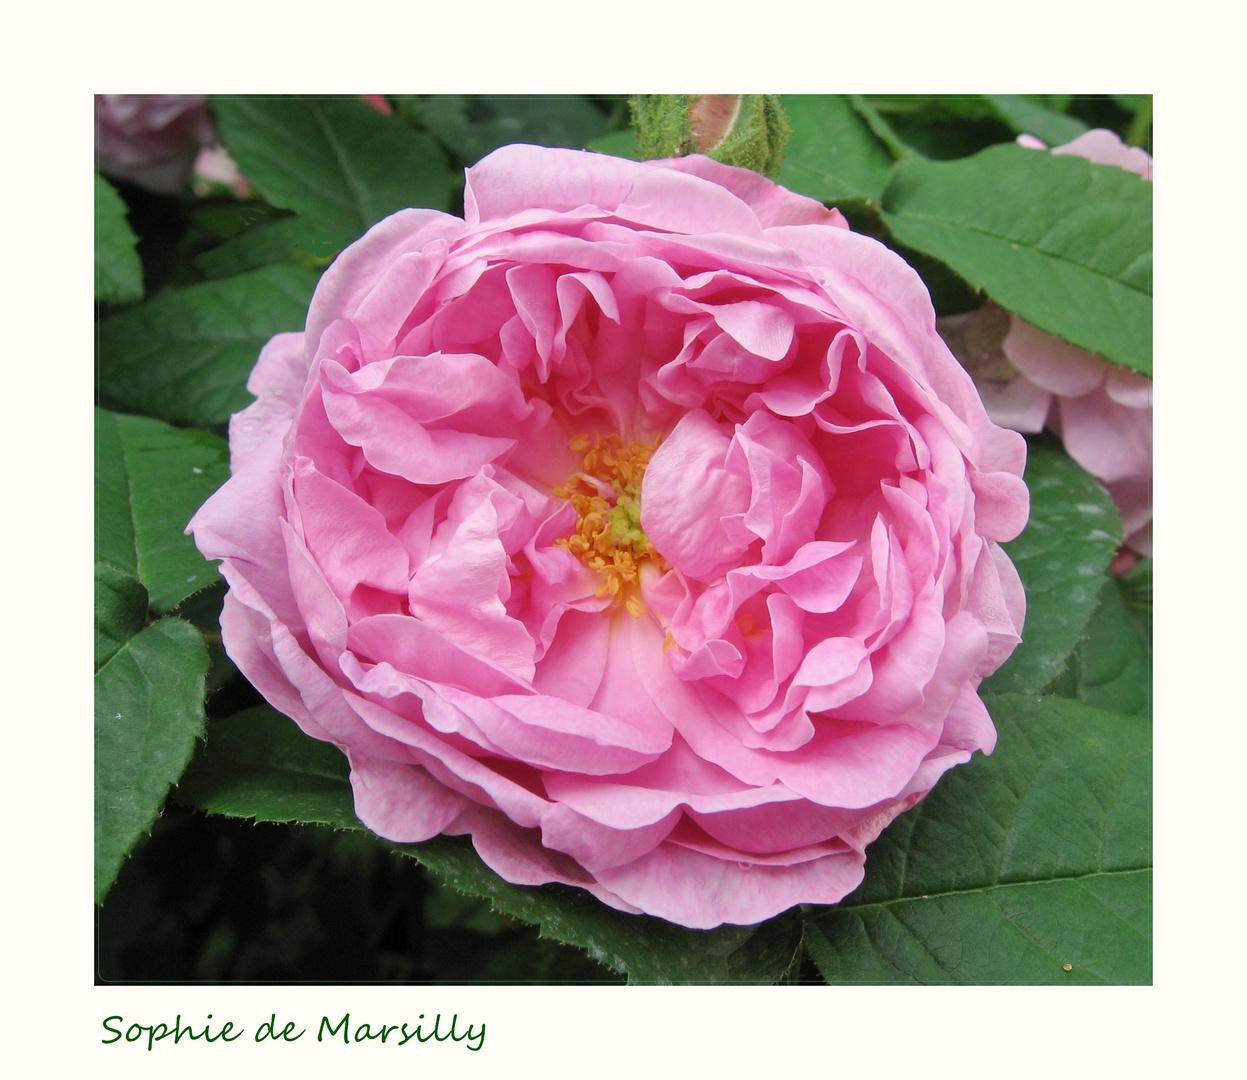 Sophie de Marsilly